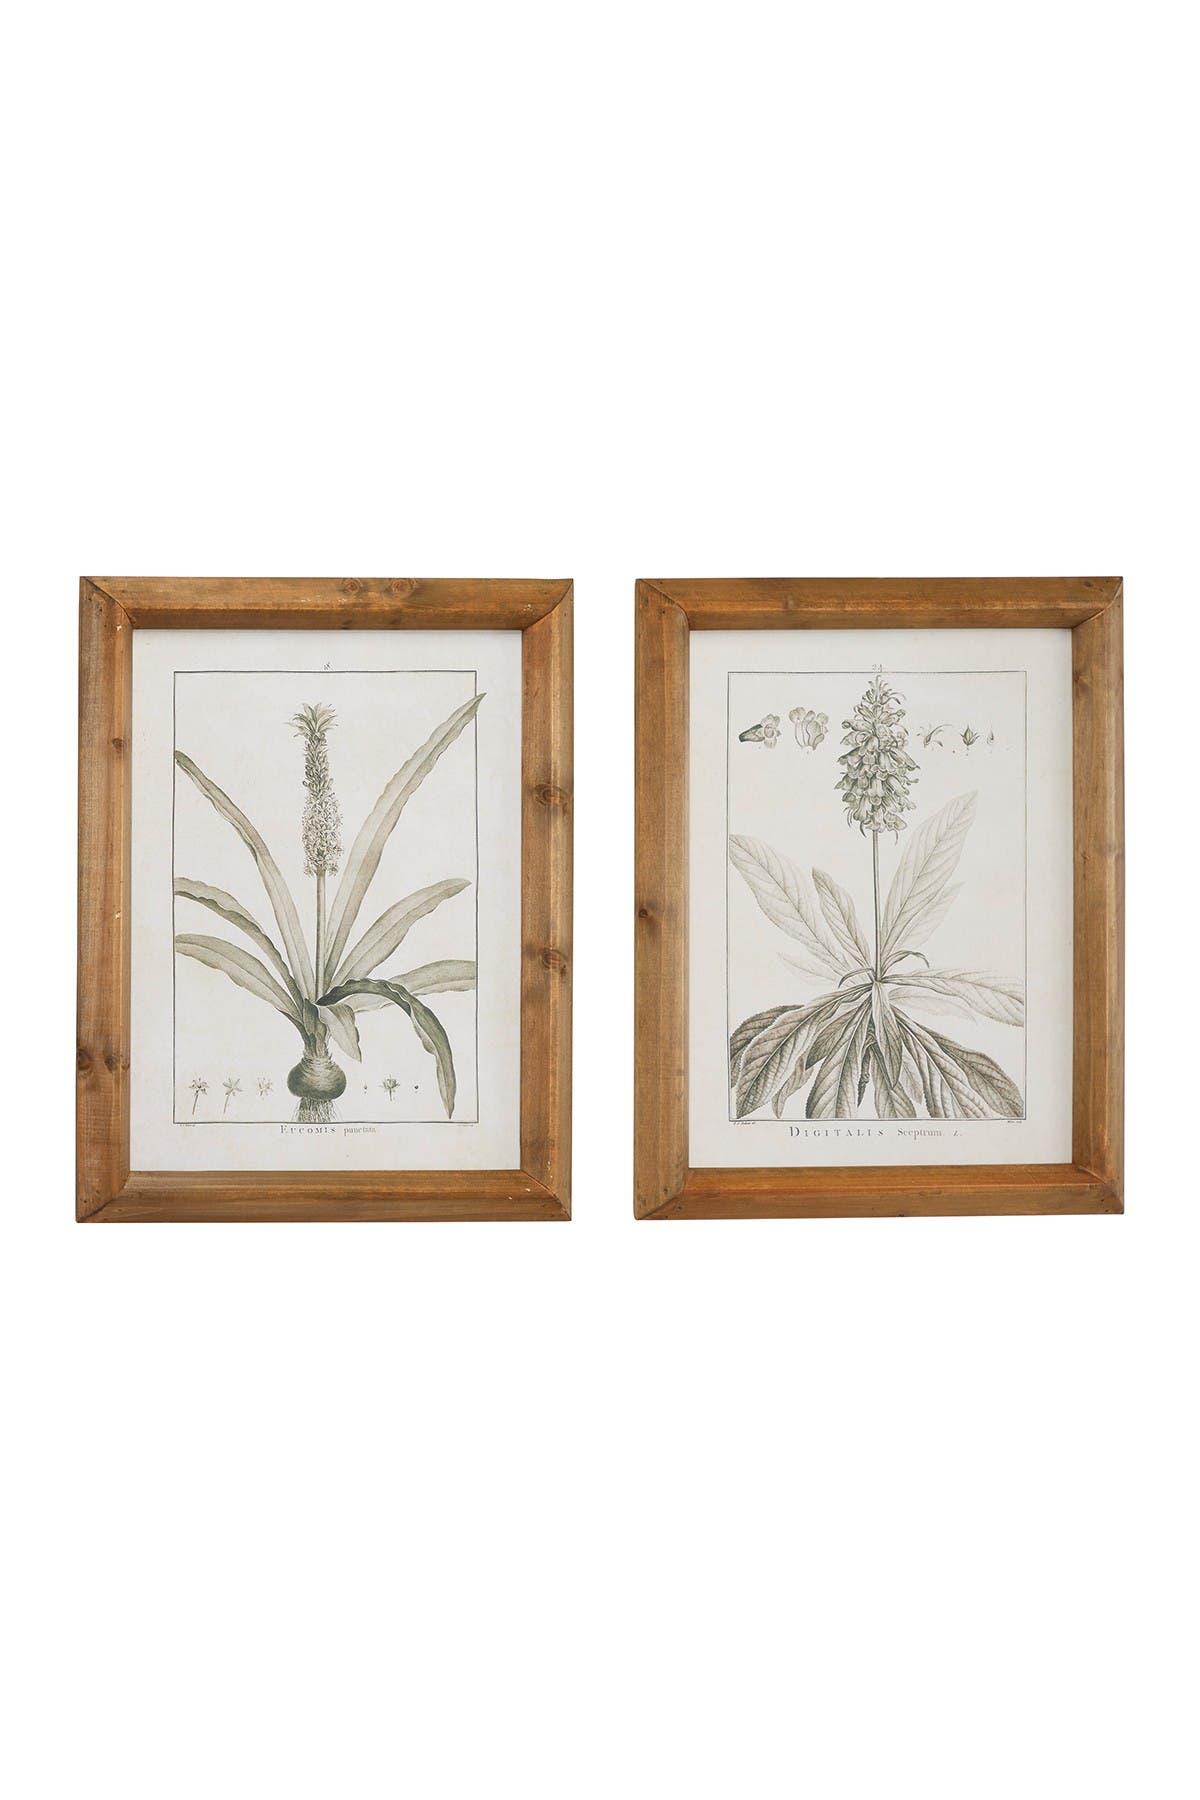 Image of Willow Row Large Black & White Vintage Botanical Prints in Natural Wood Frames - Set of 2